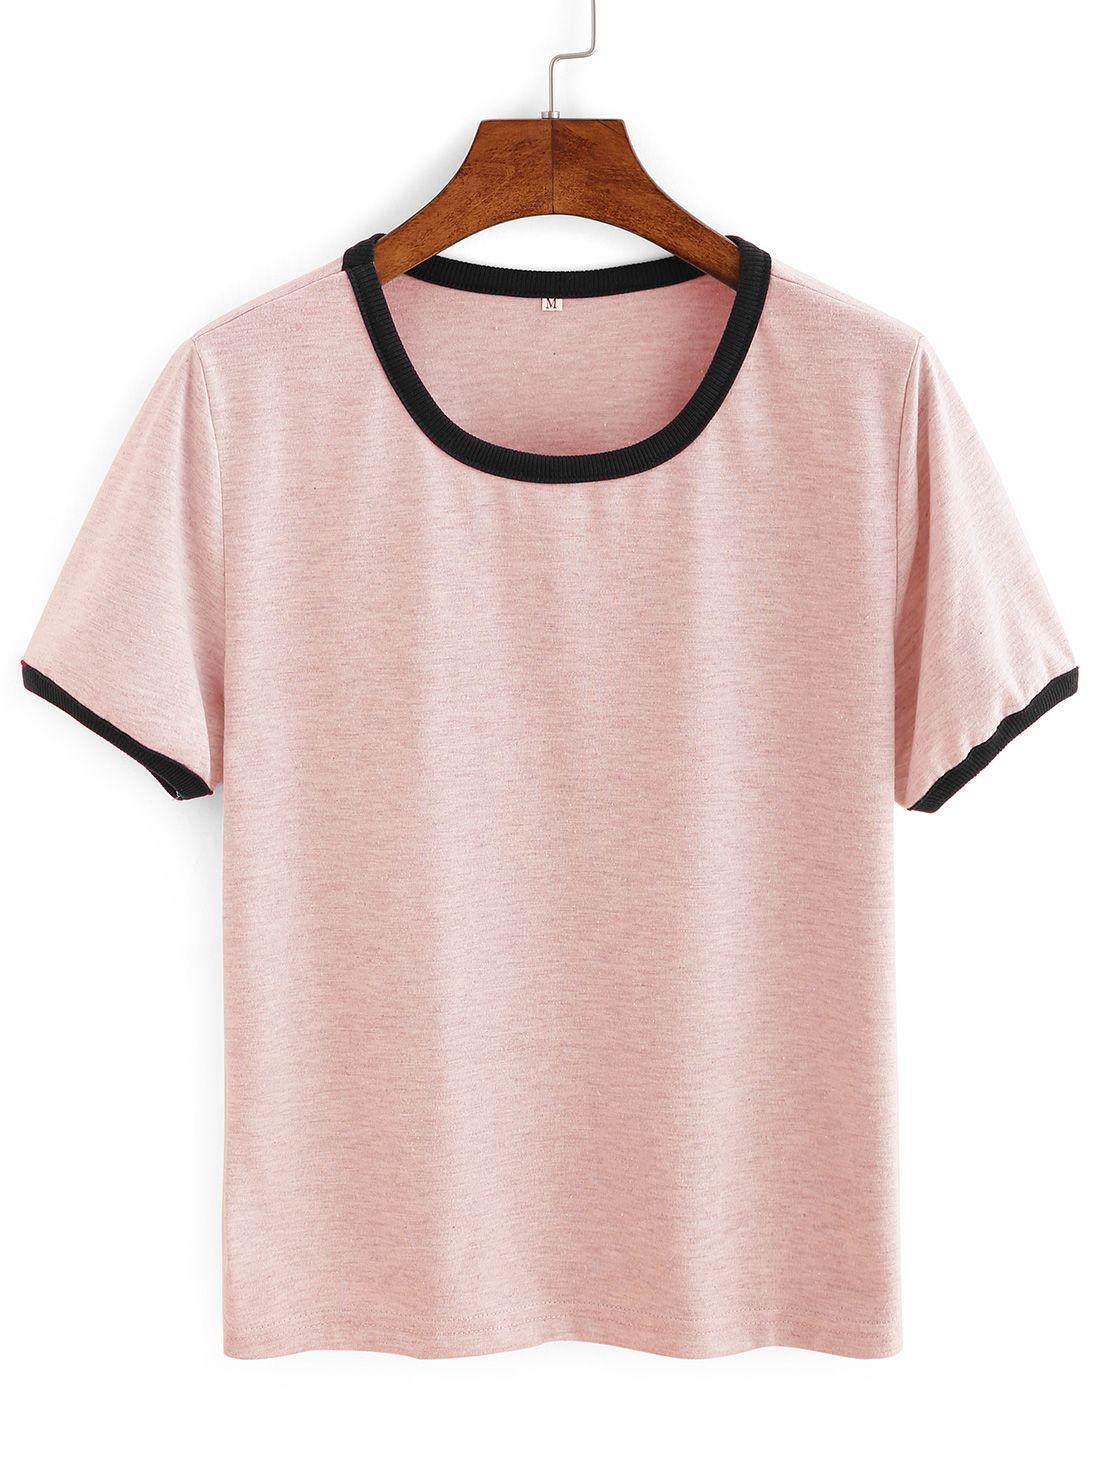 3f38665f0688 #AdoreWe #ROMWE T-shirts - Designer ROMWE Pink Contrast Round Neck T-shirt  - AdoreWe.com